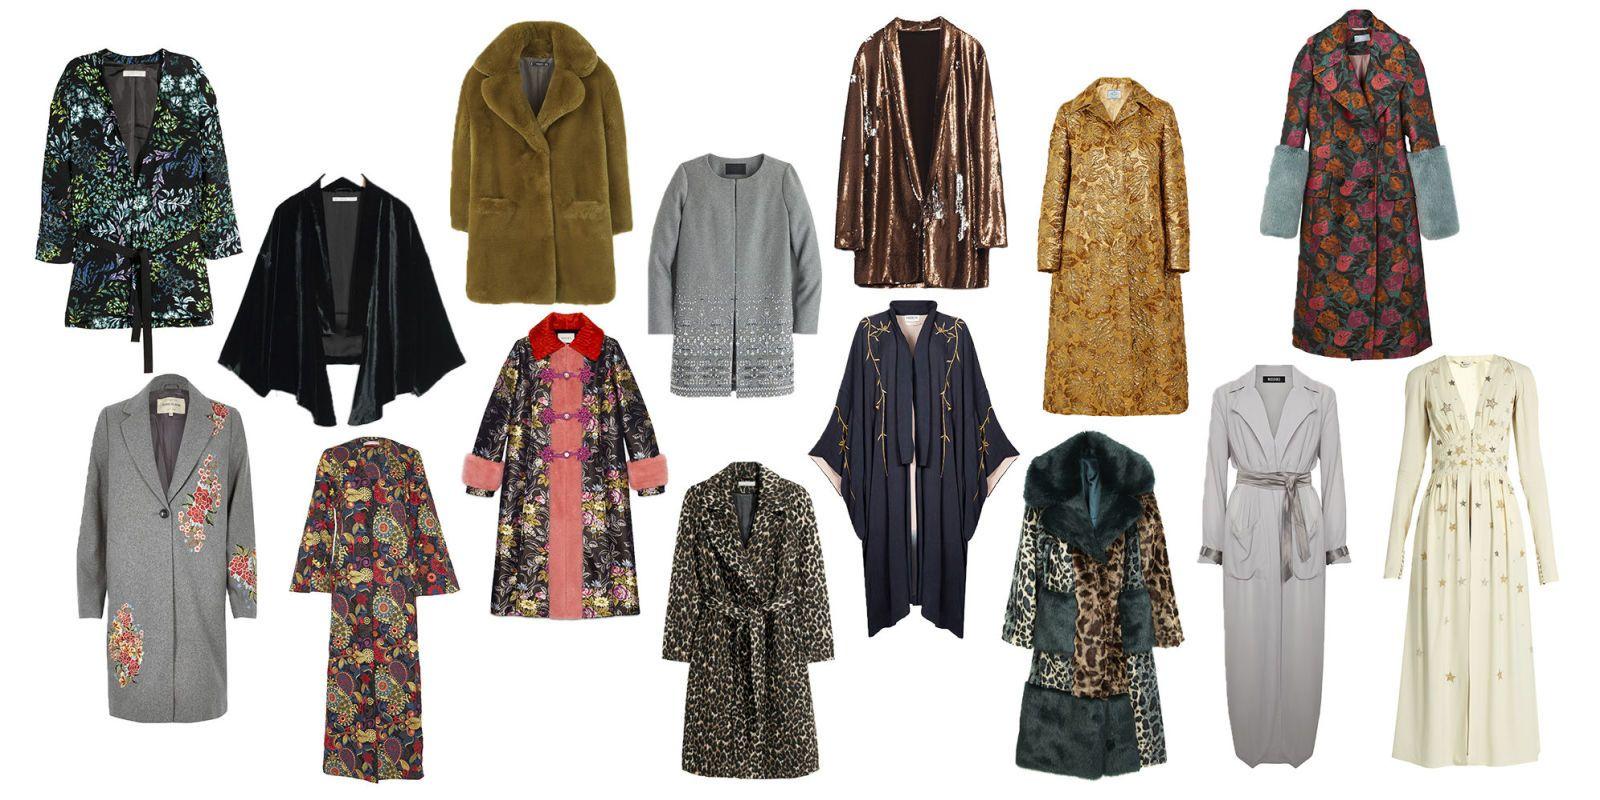 Sequins Evening Jackets for Women Popular